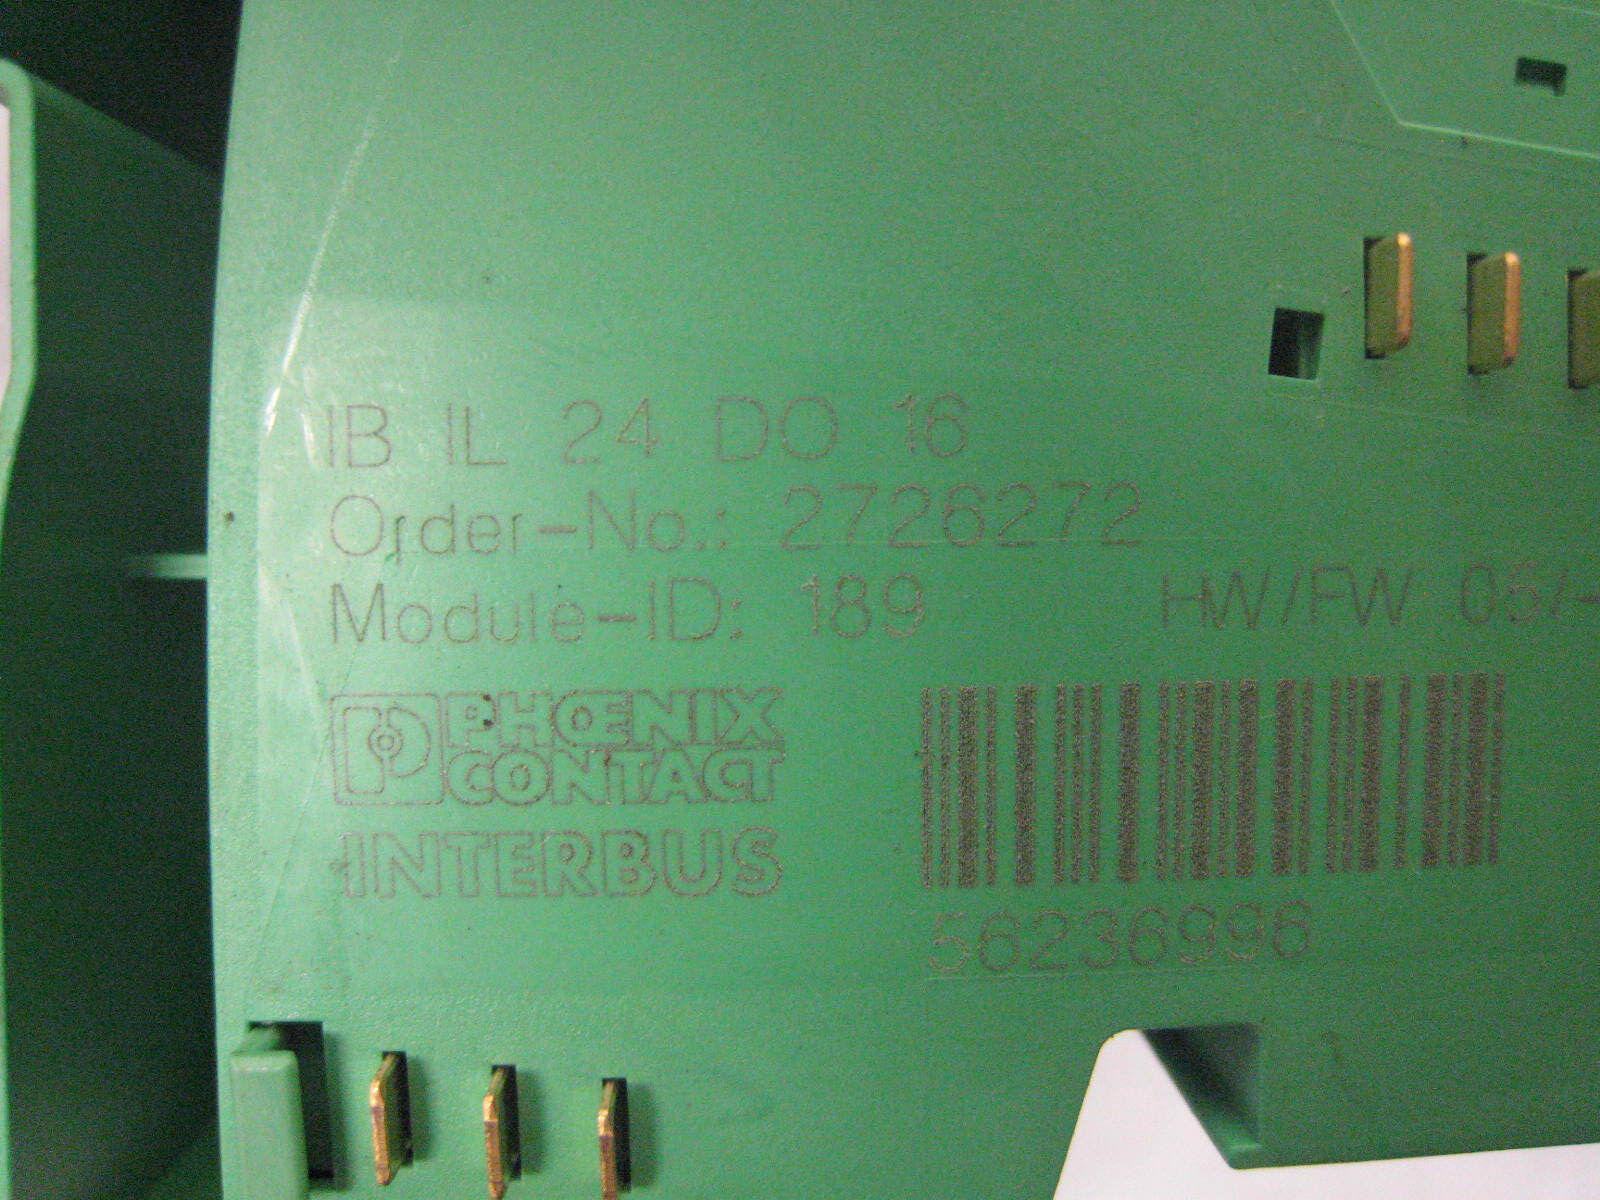 Phoenix contact IB il do 16 inline-borna-Order nº 2726272 #